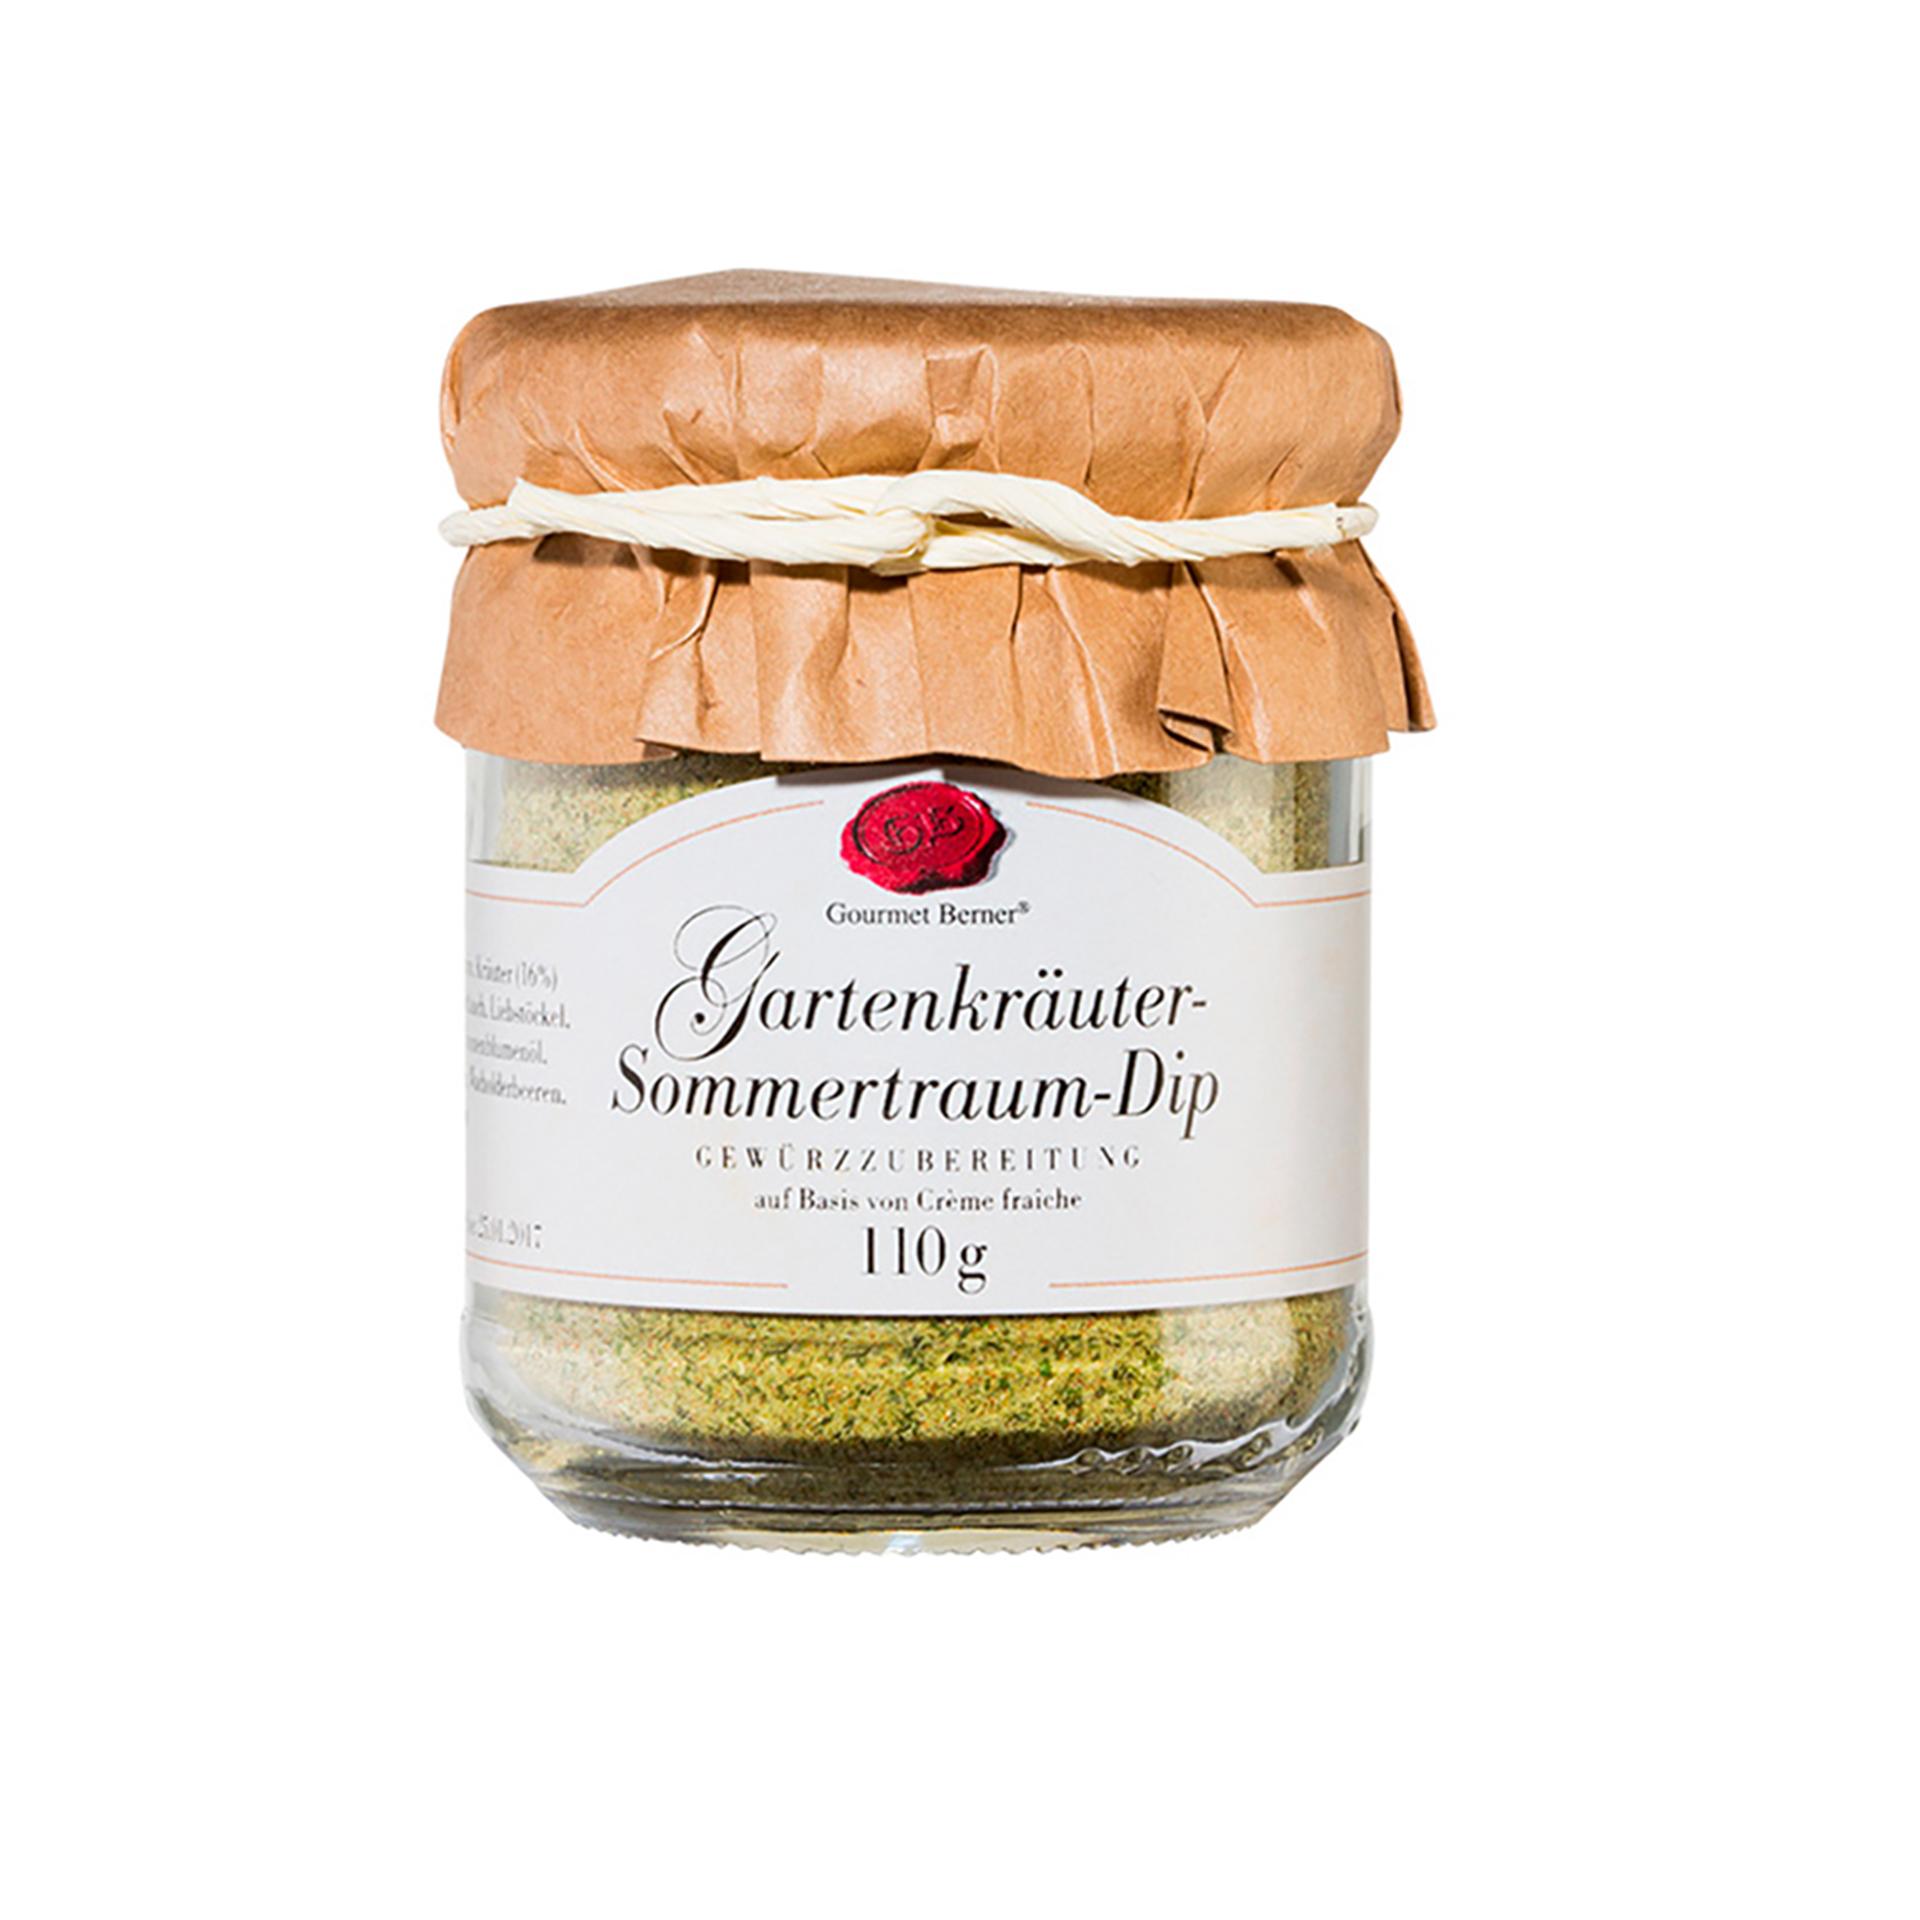 Gourmet Berner - Gartenkräuter Sommertraum Dip, 110g Glas